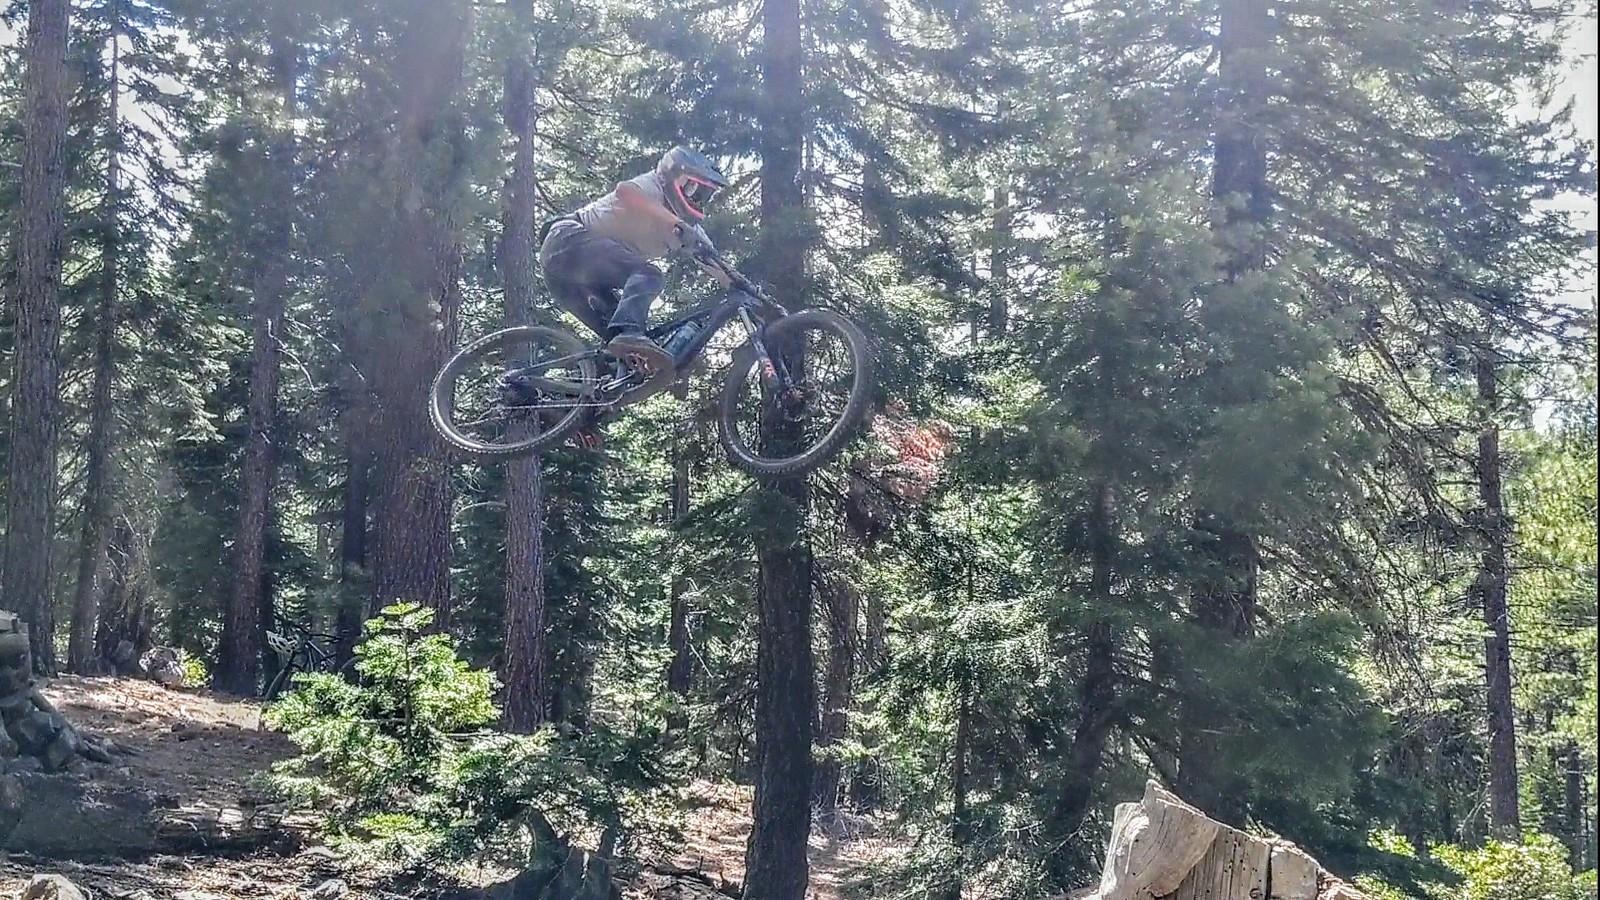 Marty - switzb15 - Mountain Biking Pictures - Vital MTB